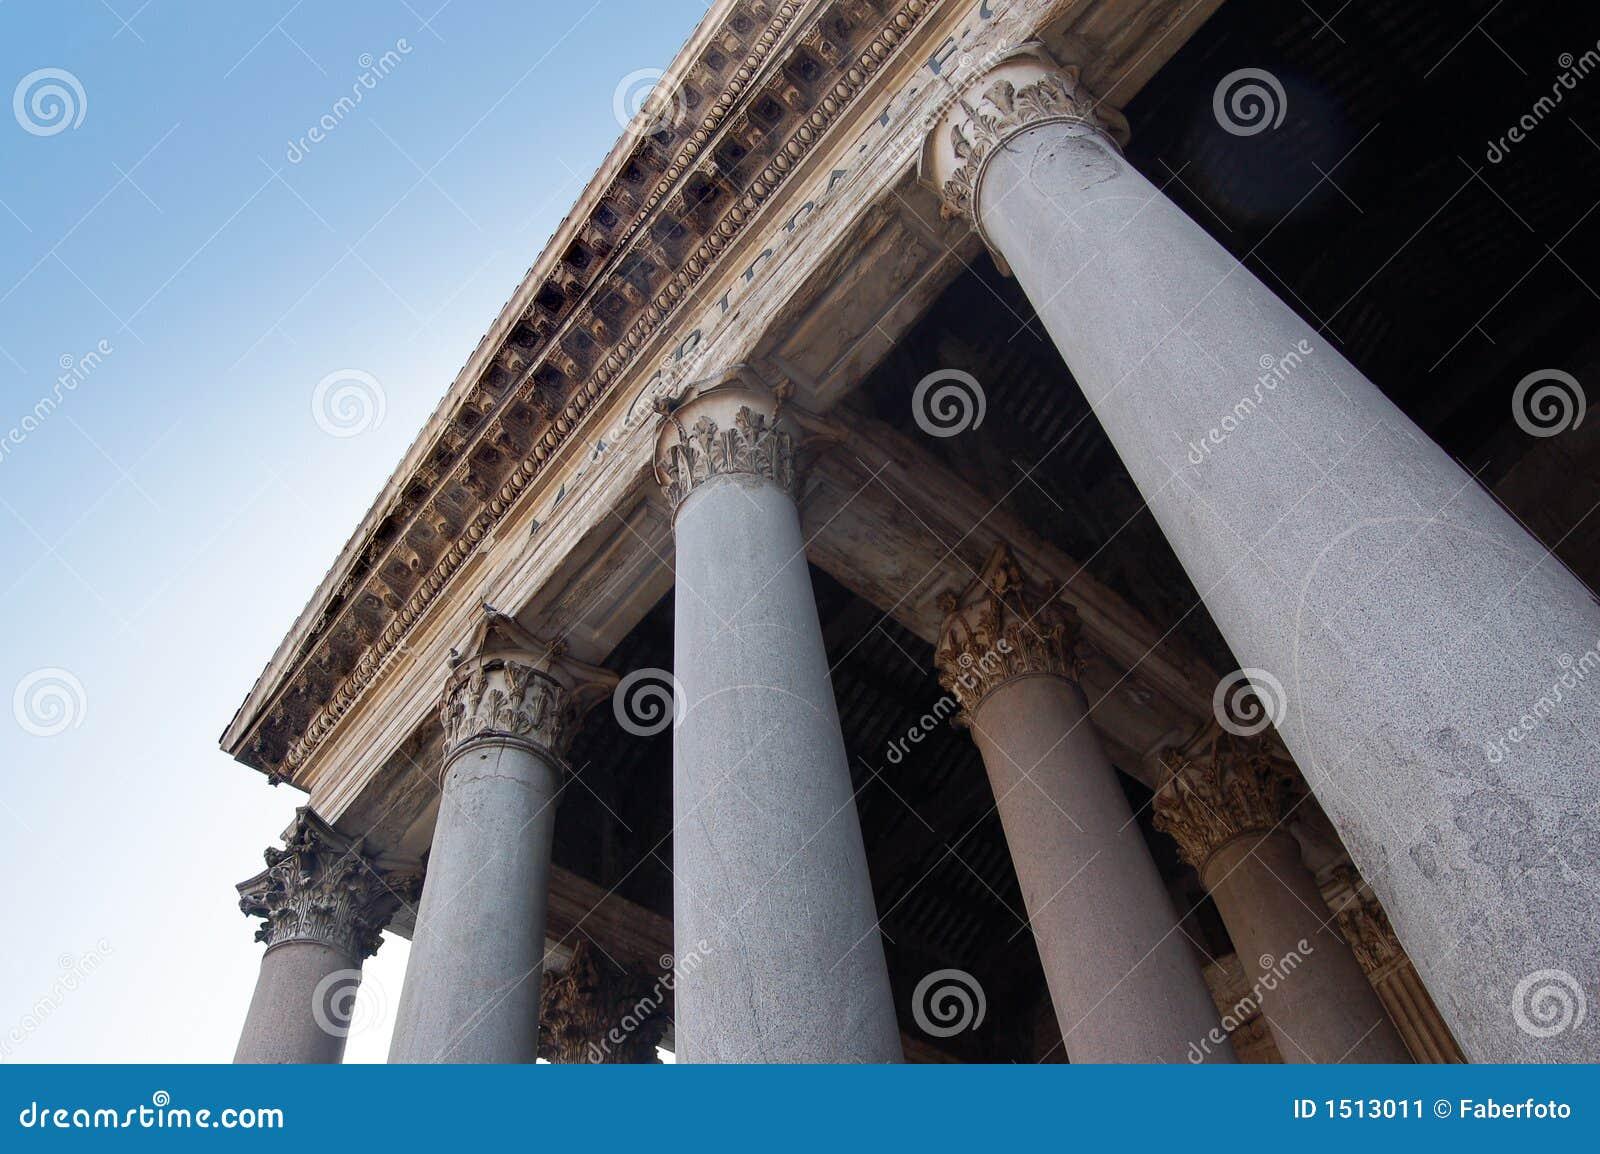 Italy pantheon rome